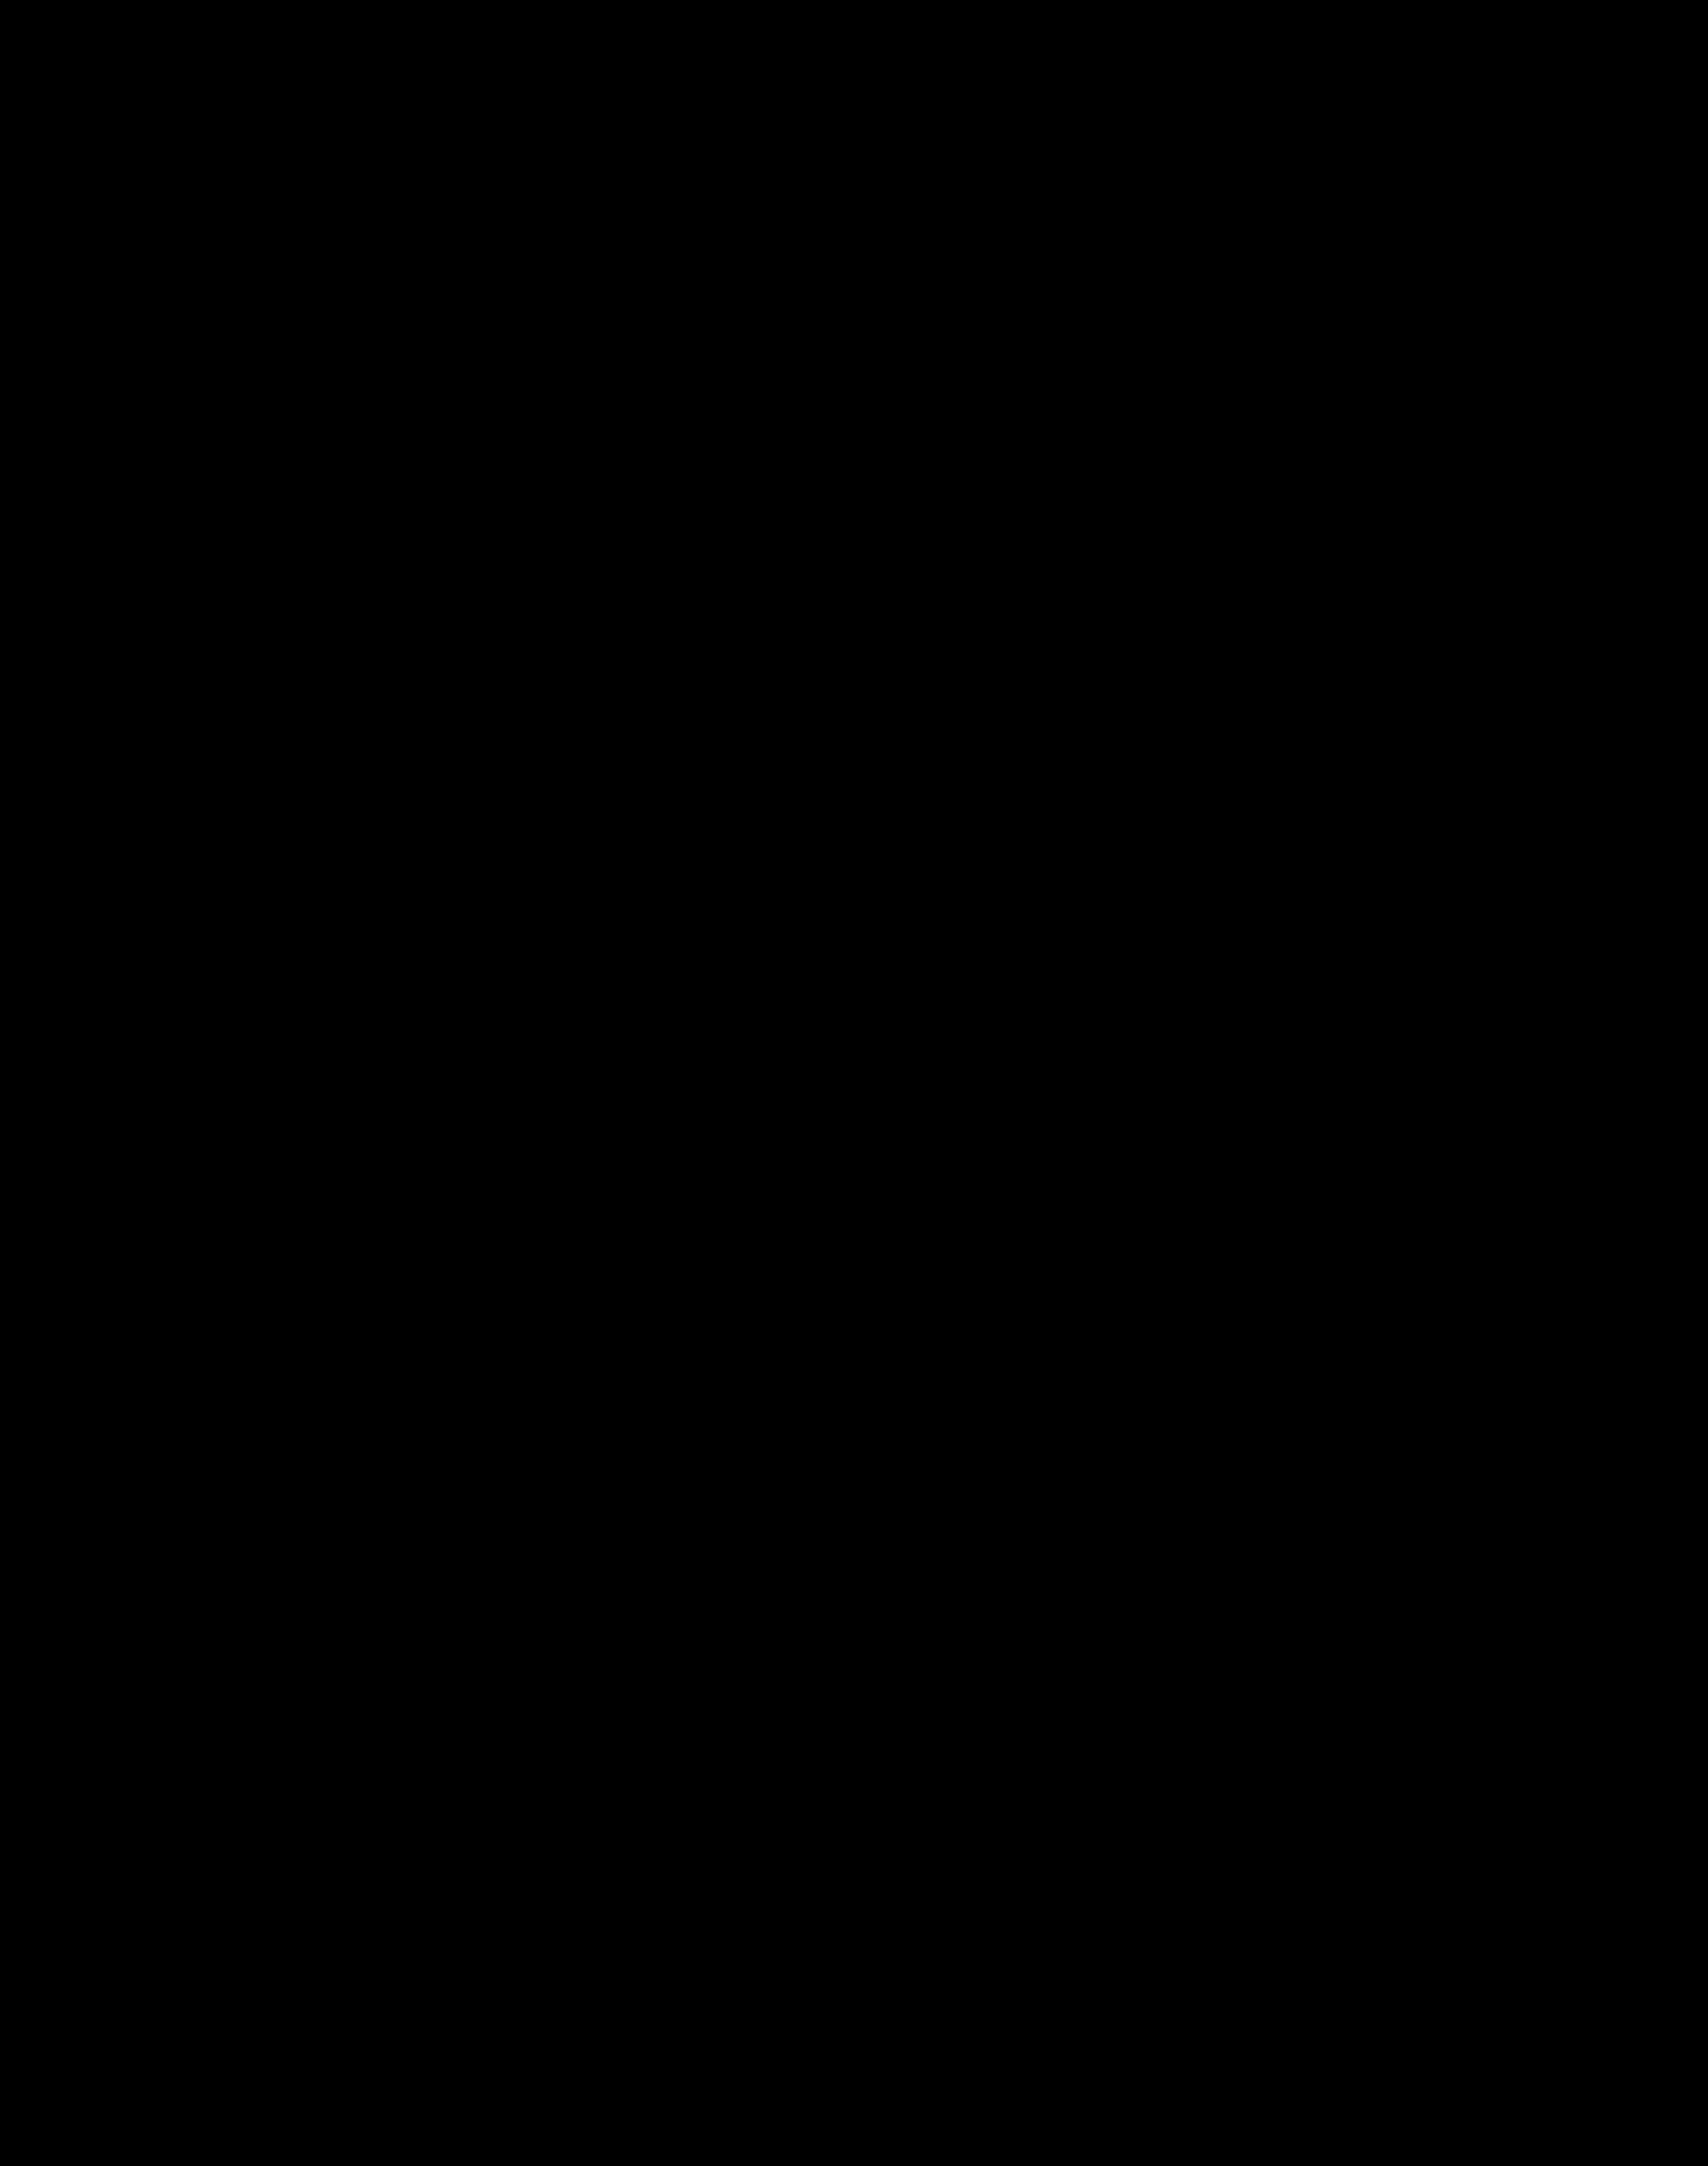 1893x2400 Bird Of Prey Clipart Flight Silhouette Clip Art